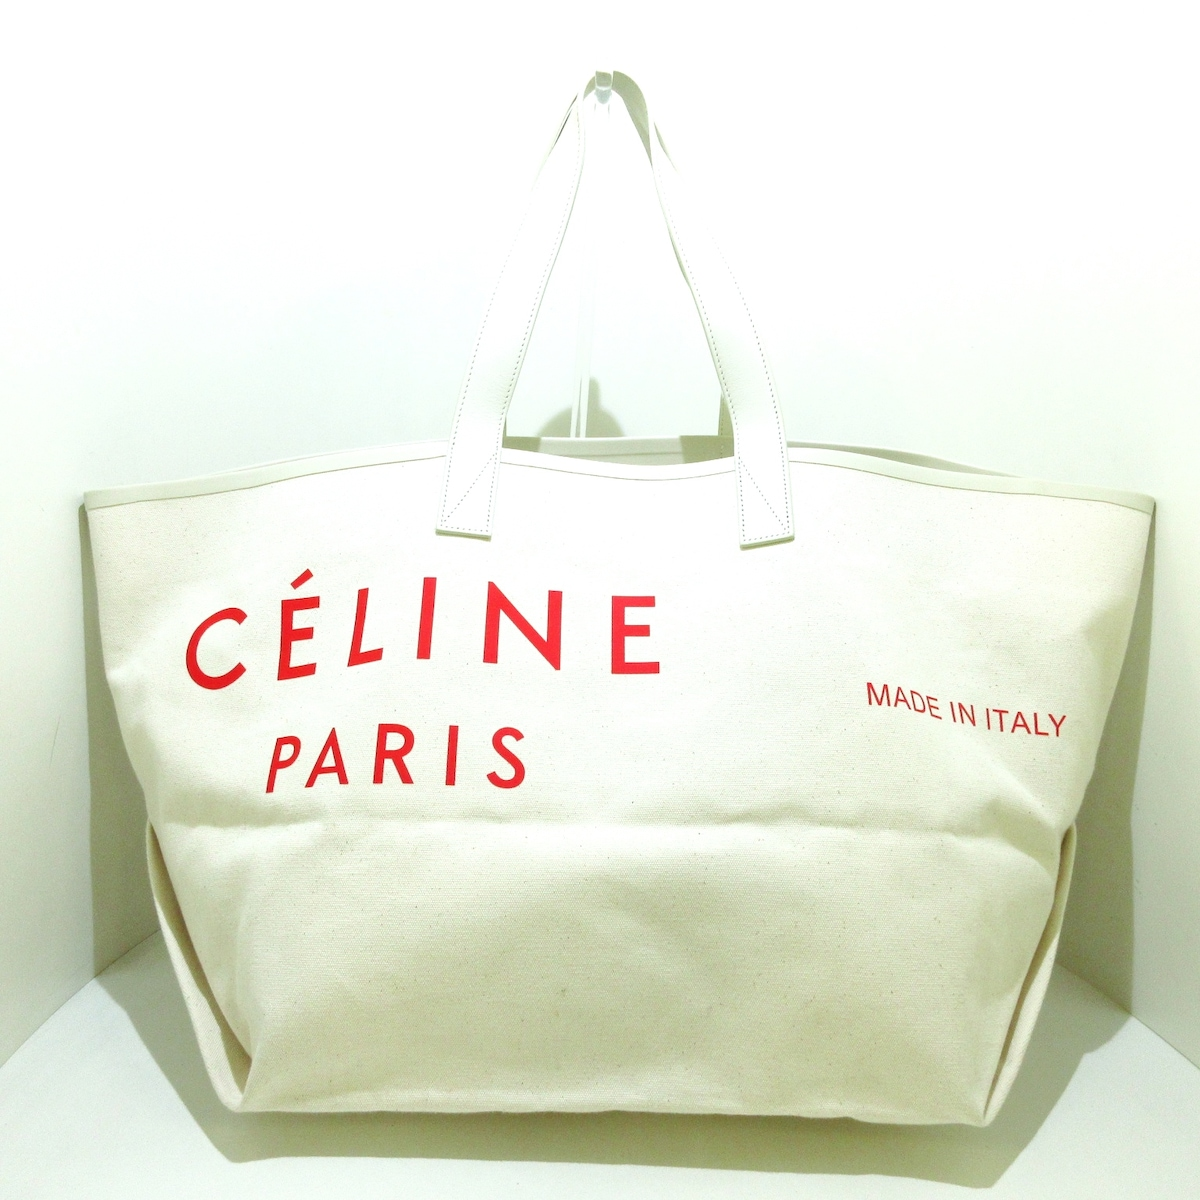 CELINE(セリーヌ)のメイドイントート ミディアム/ミディアムカバス